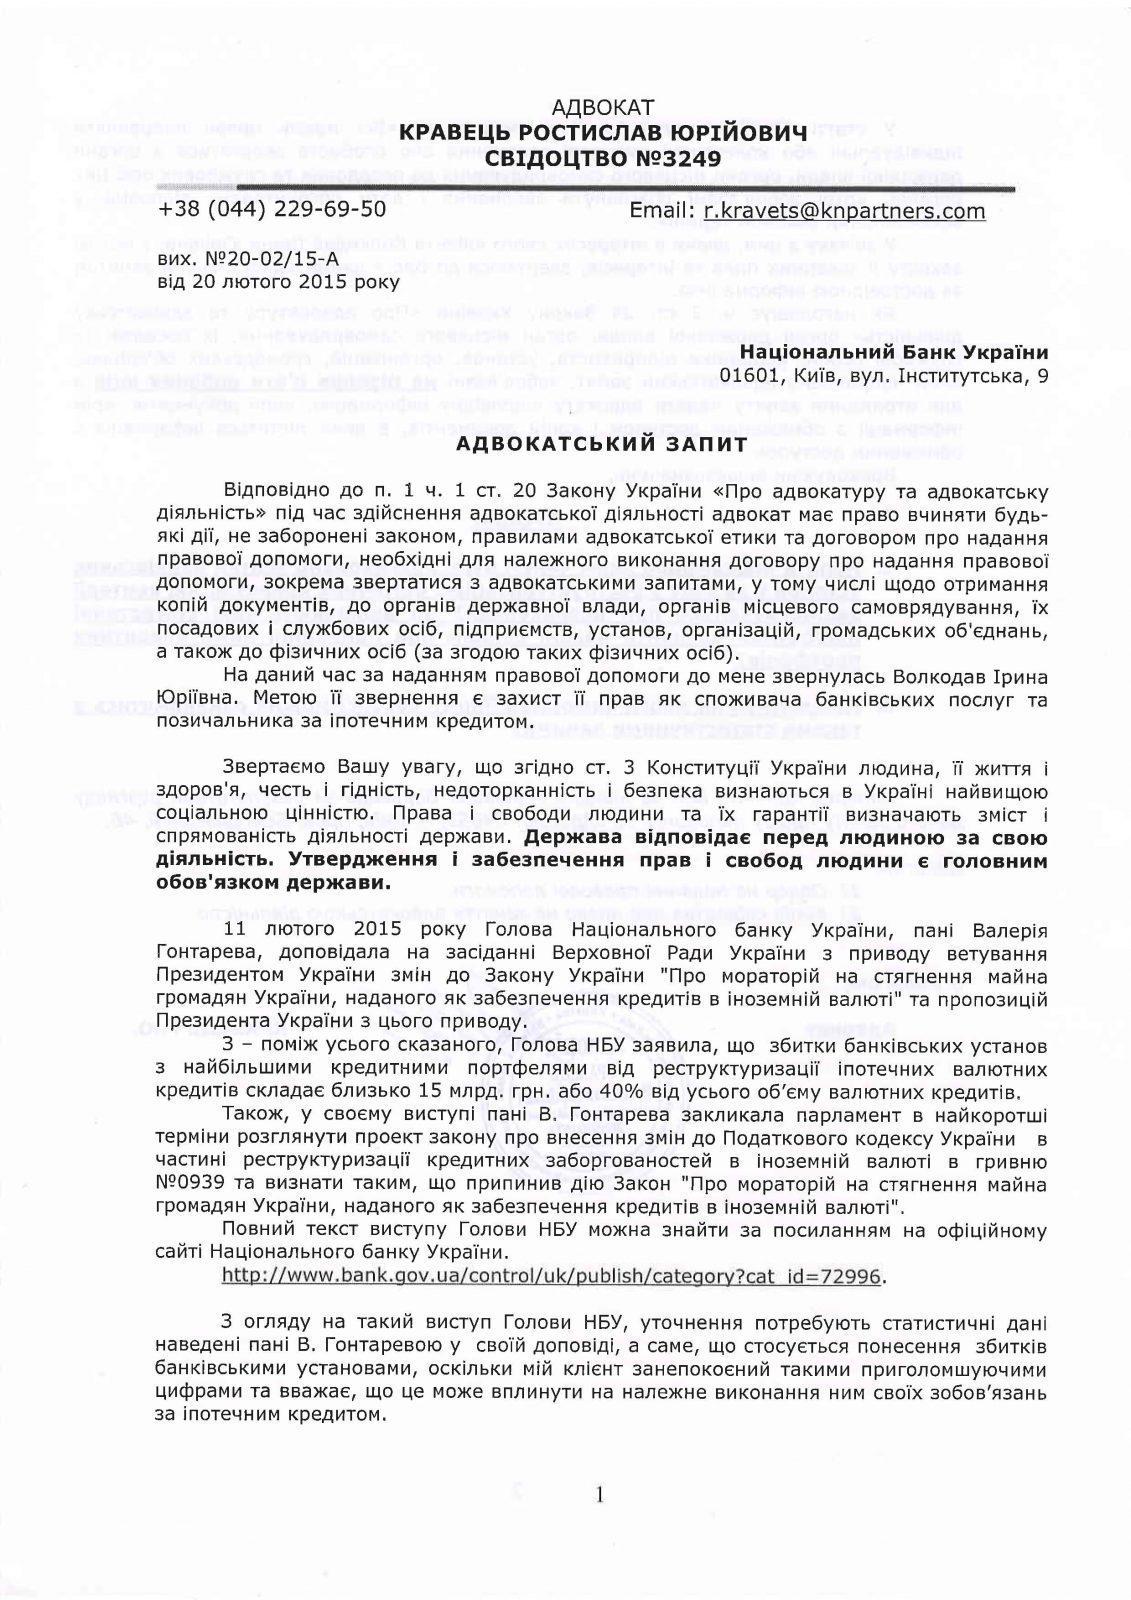 Реструктуризация Третейский Суд zapros nbu restrukturizaciya1